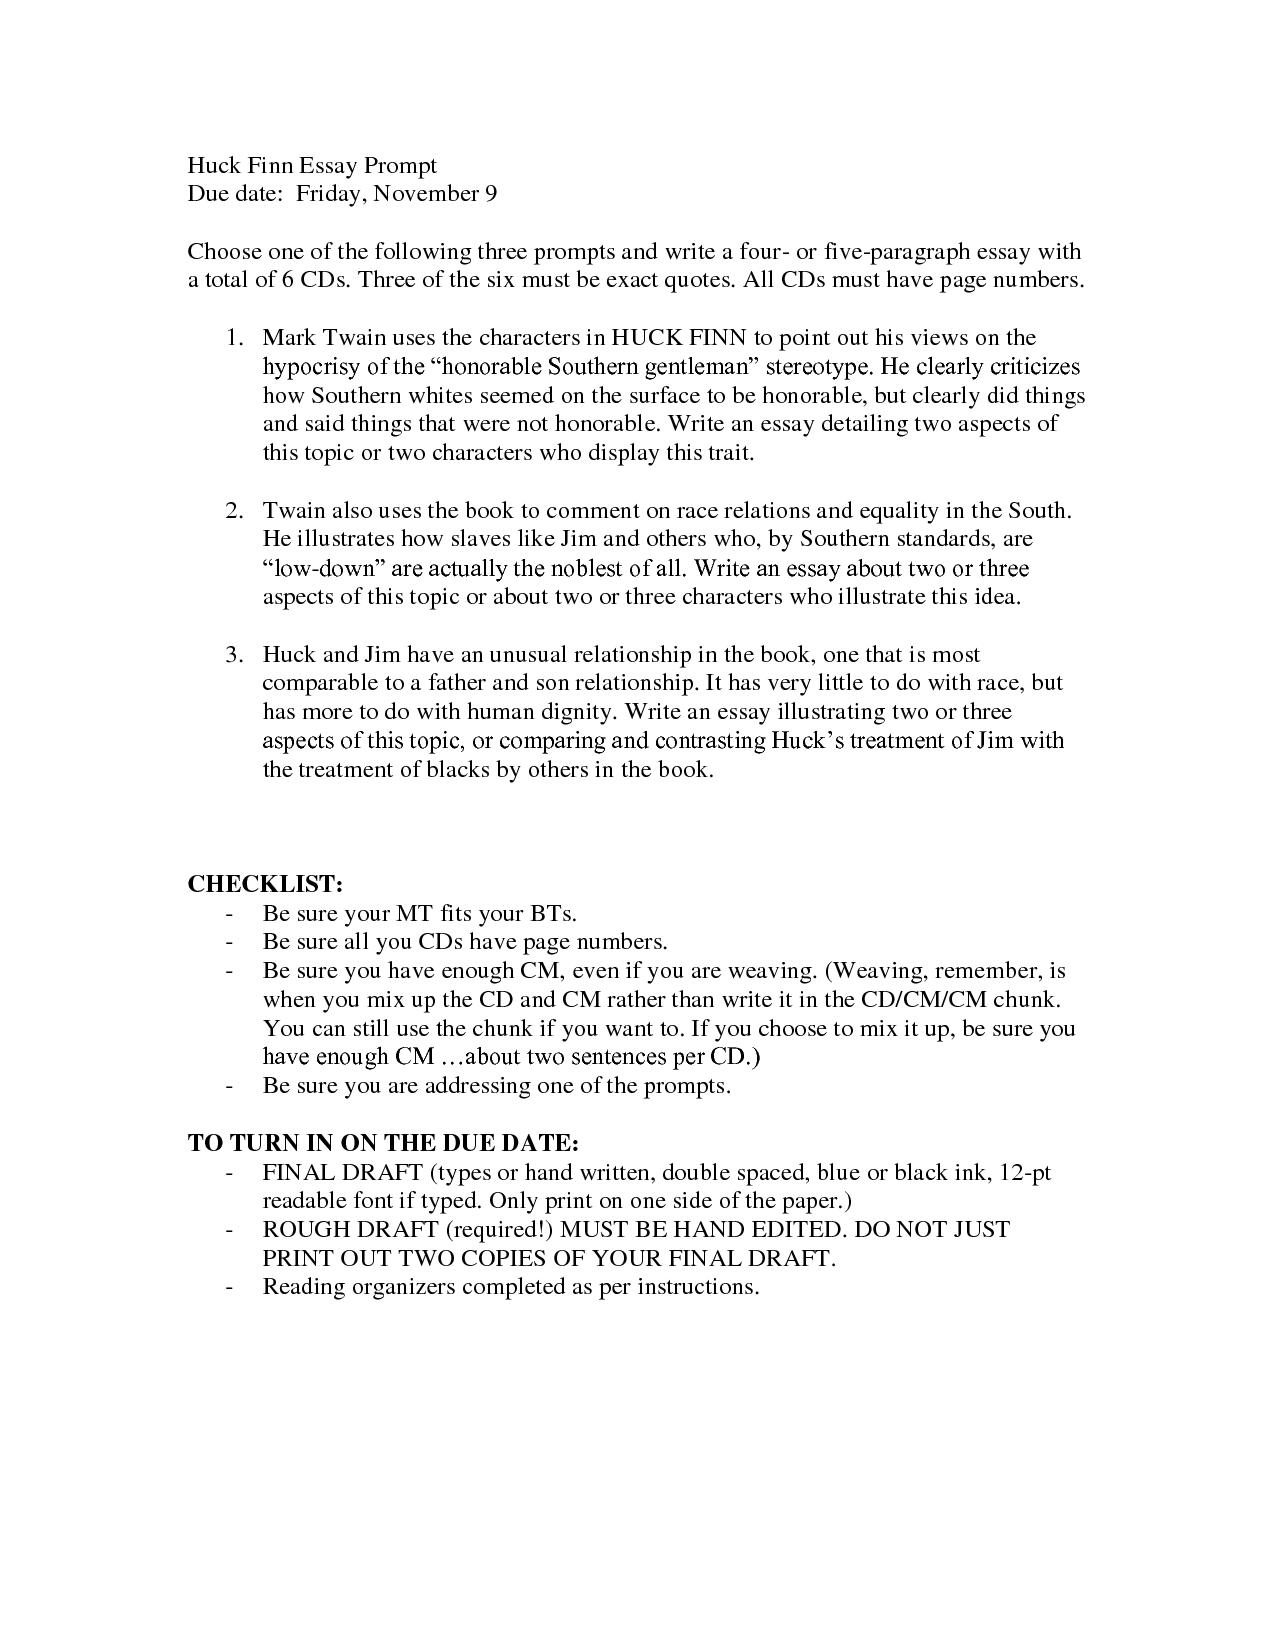 huck finn and jim relationship essay ideas